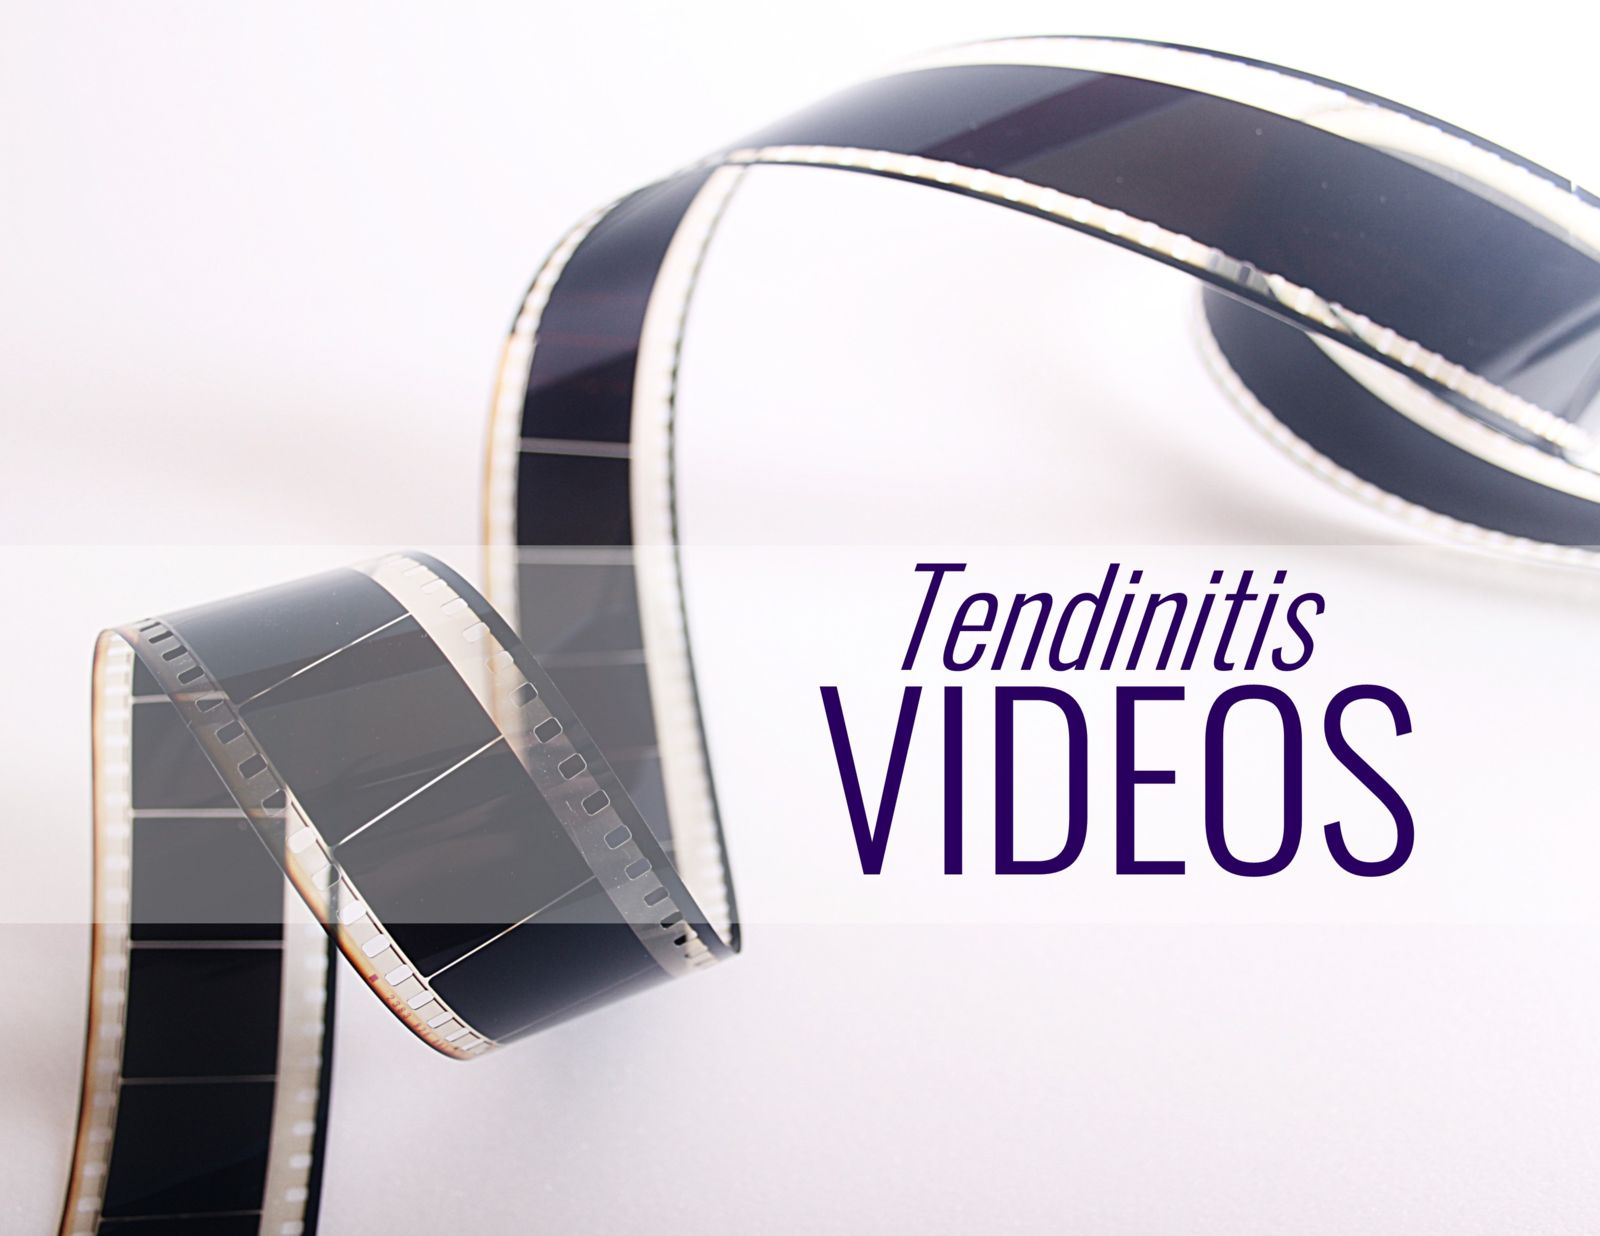 film reel and the words Tendinitis Videos